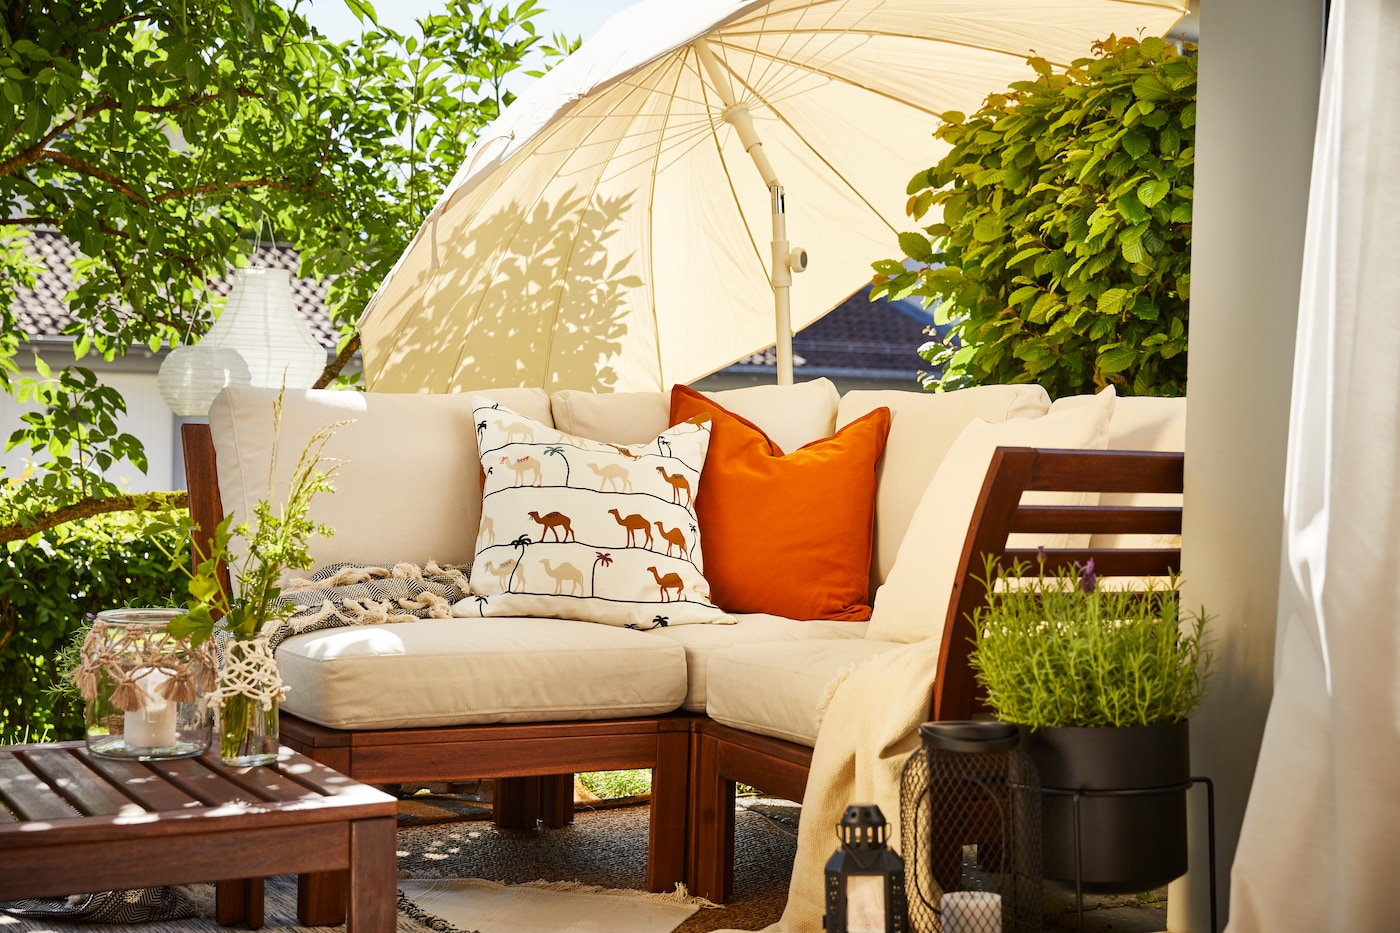 Terrasse ensoleillée avec salon de jardin en bois